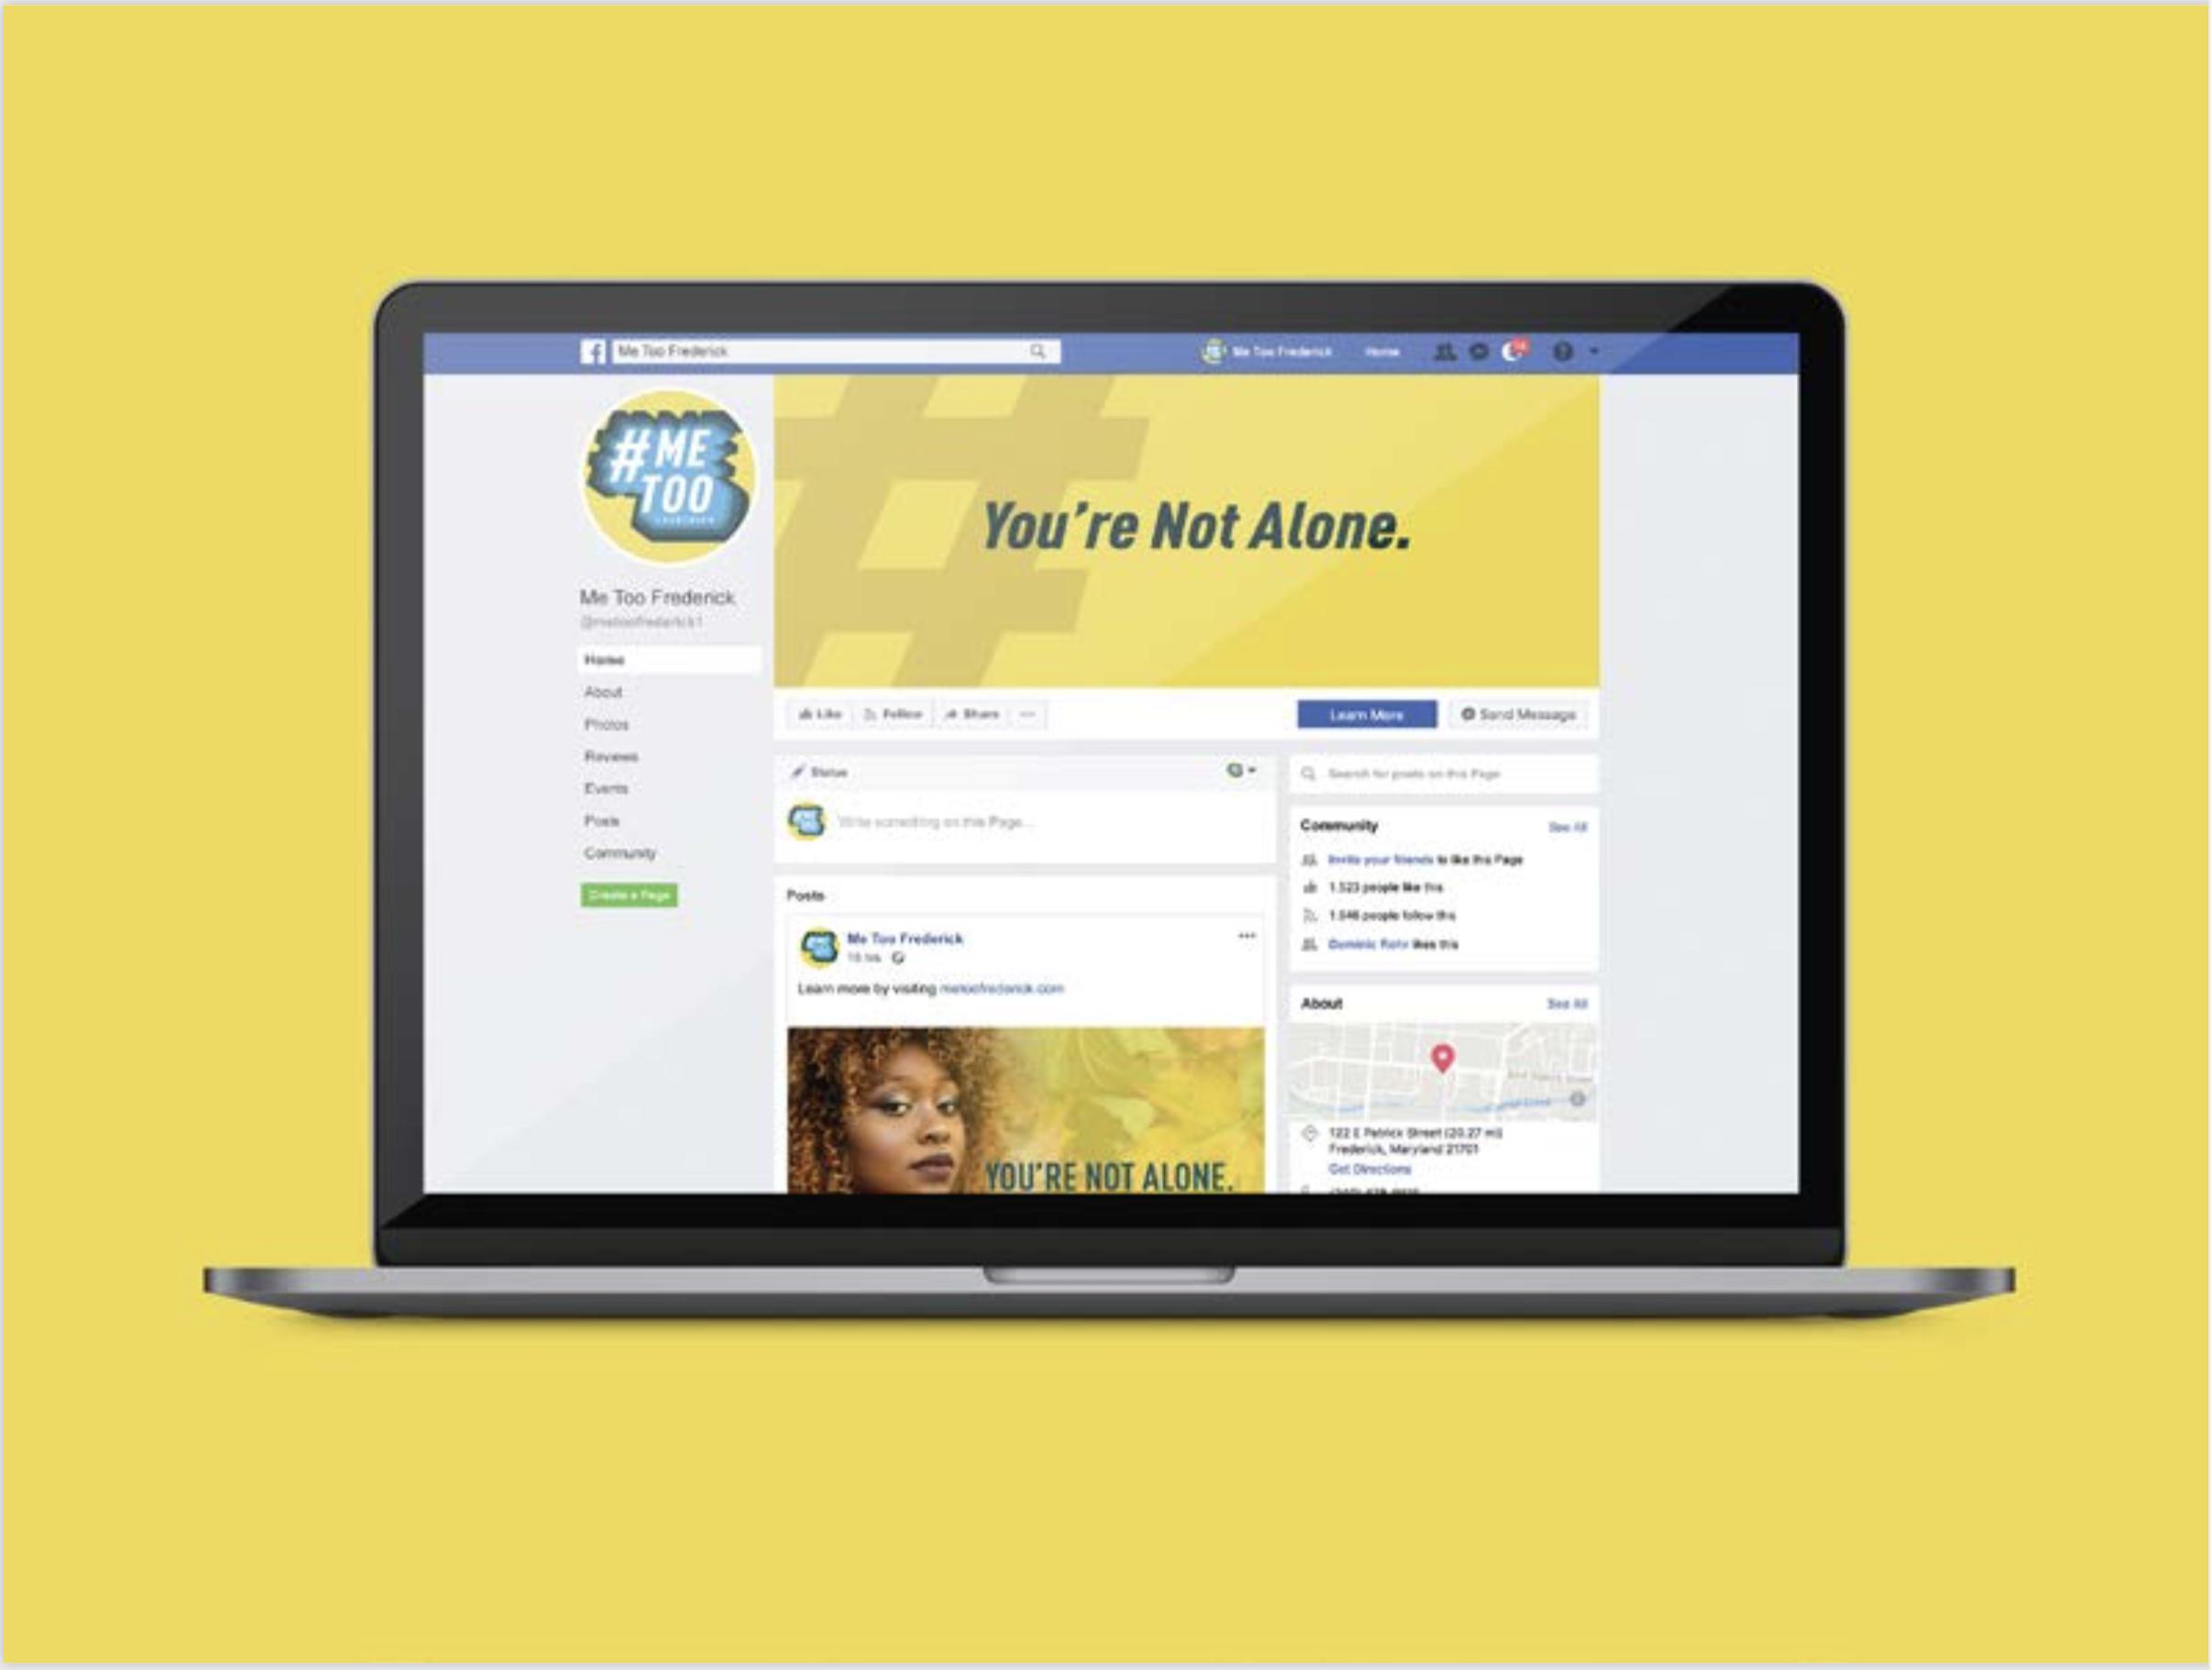 #MeTooFrederick Facebook (Desktop)